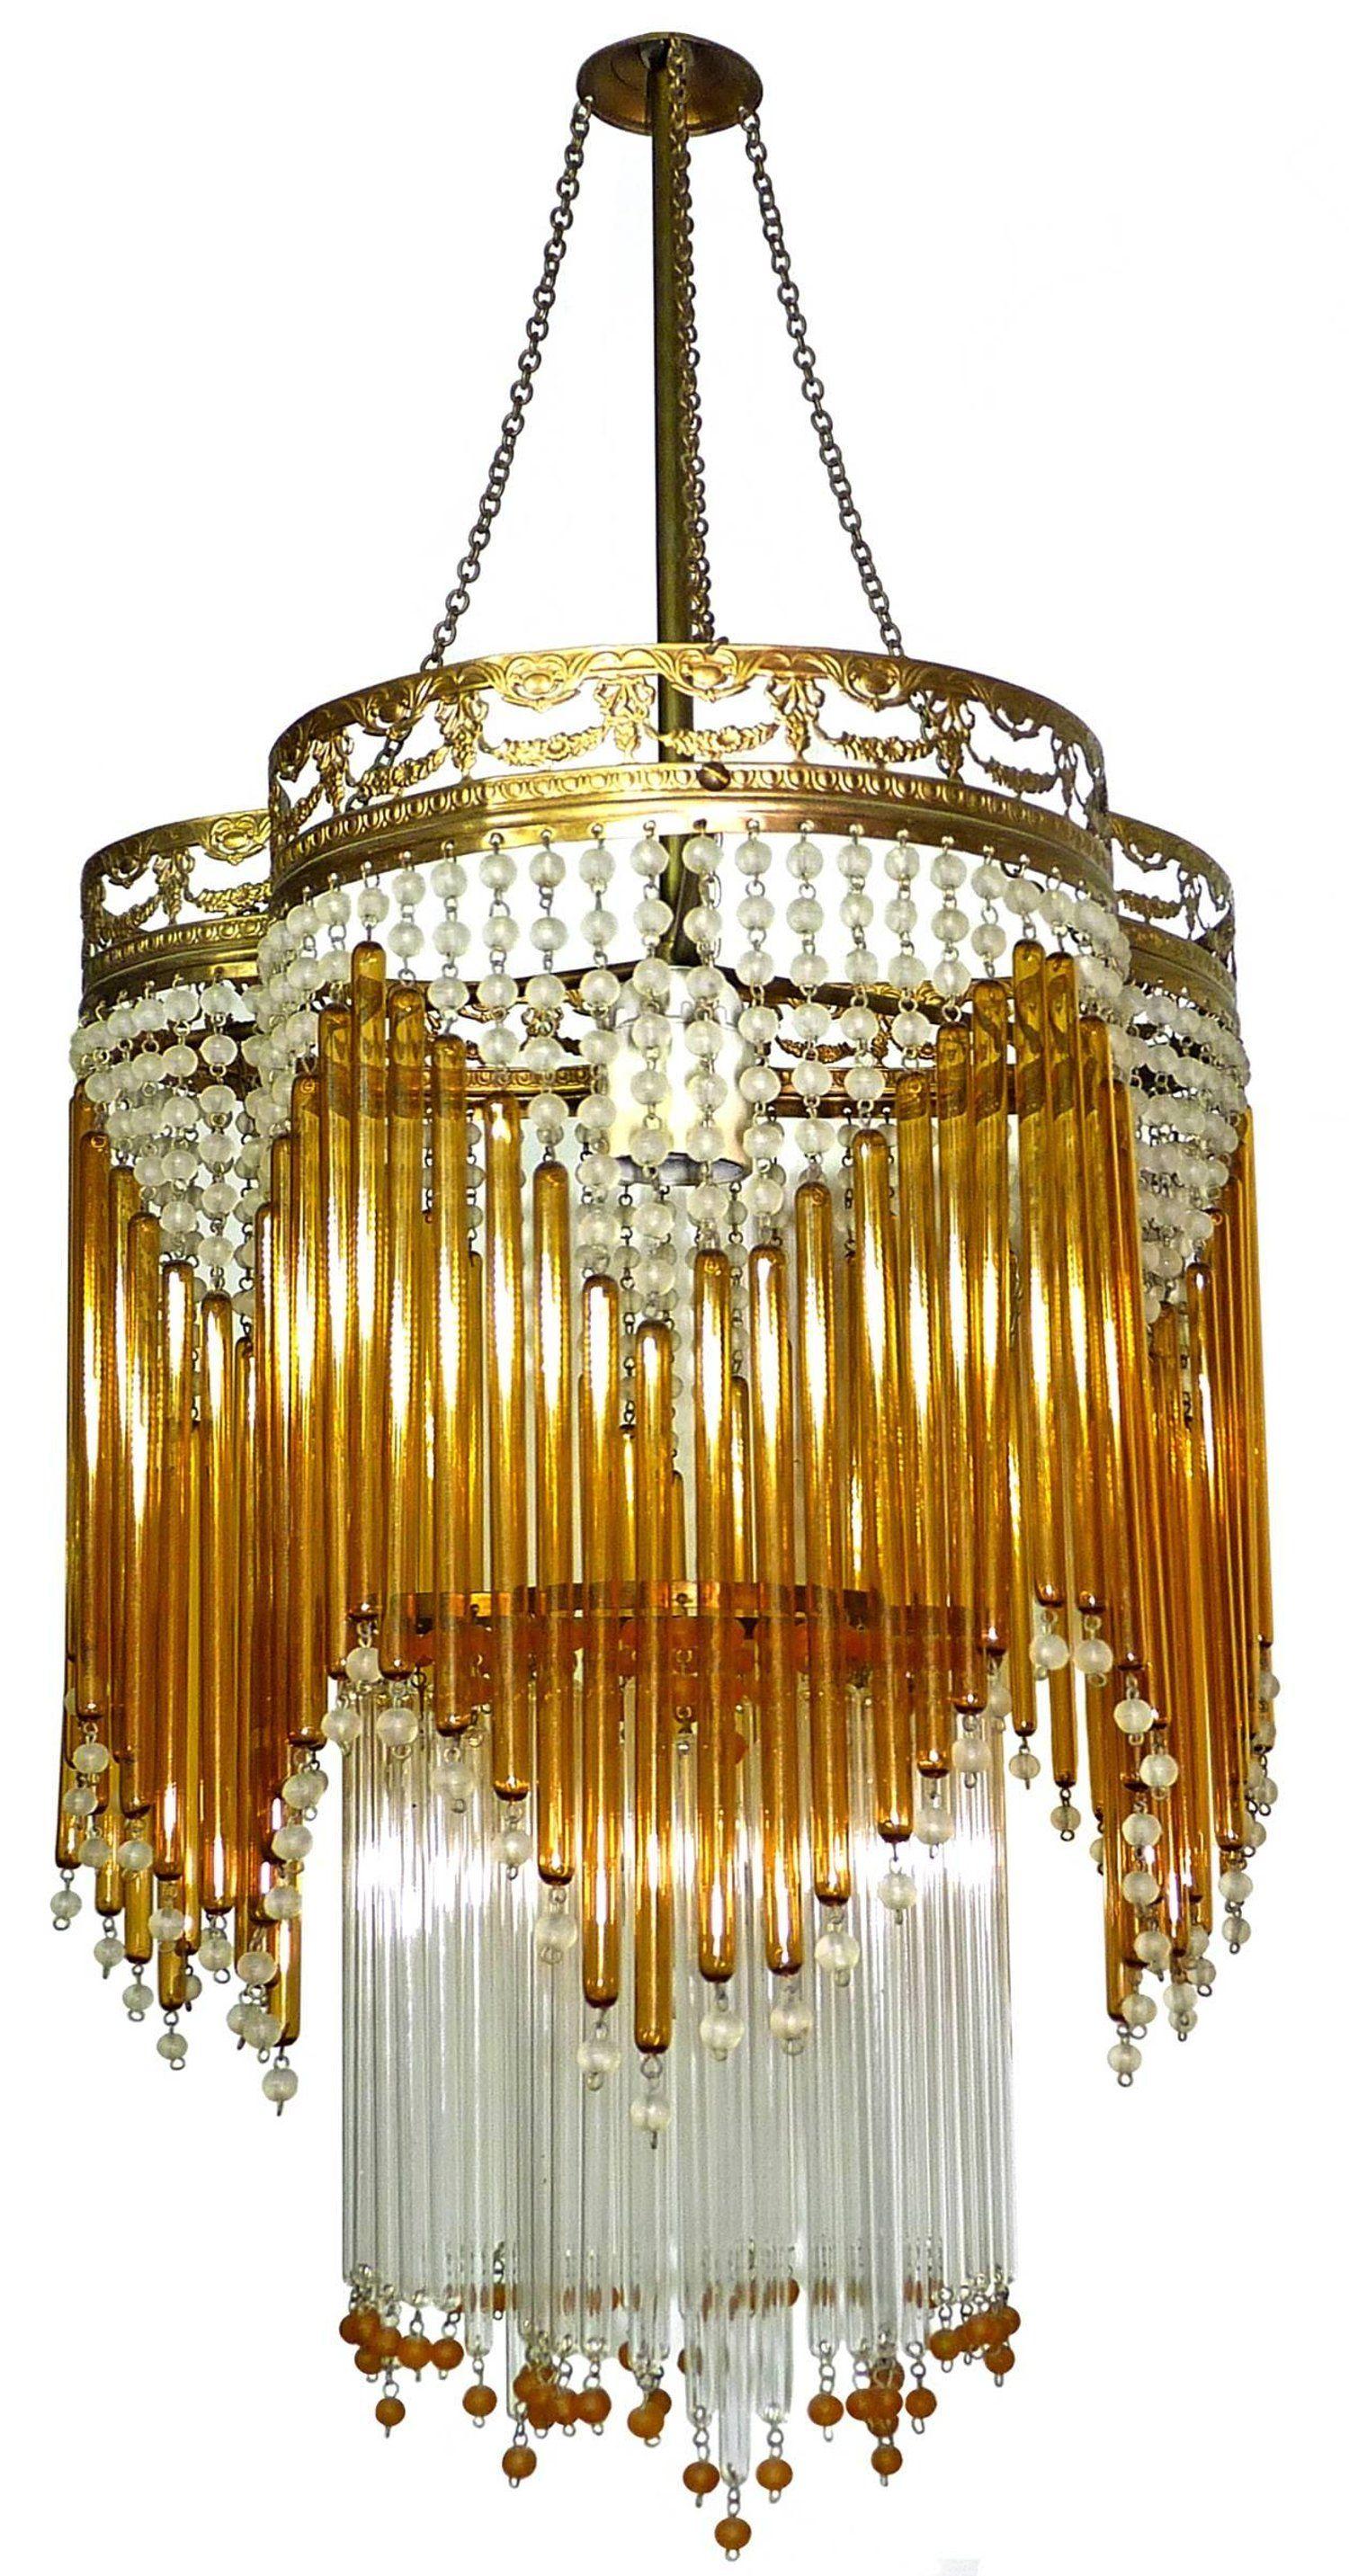 Italian Art Deco Art Nouveau Amber And Clear Beaded Glass Murano